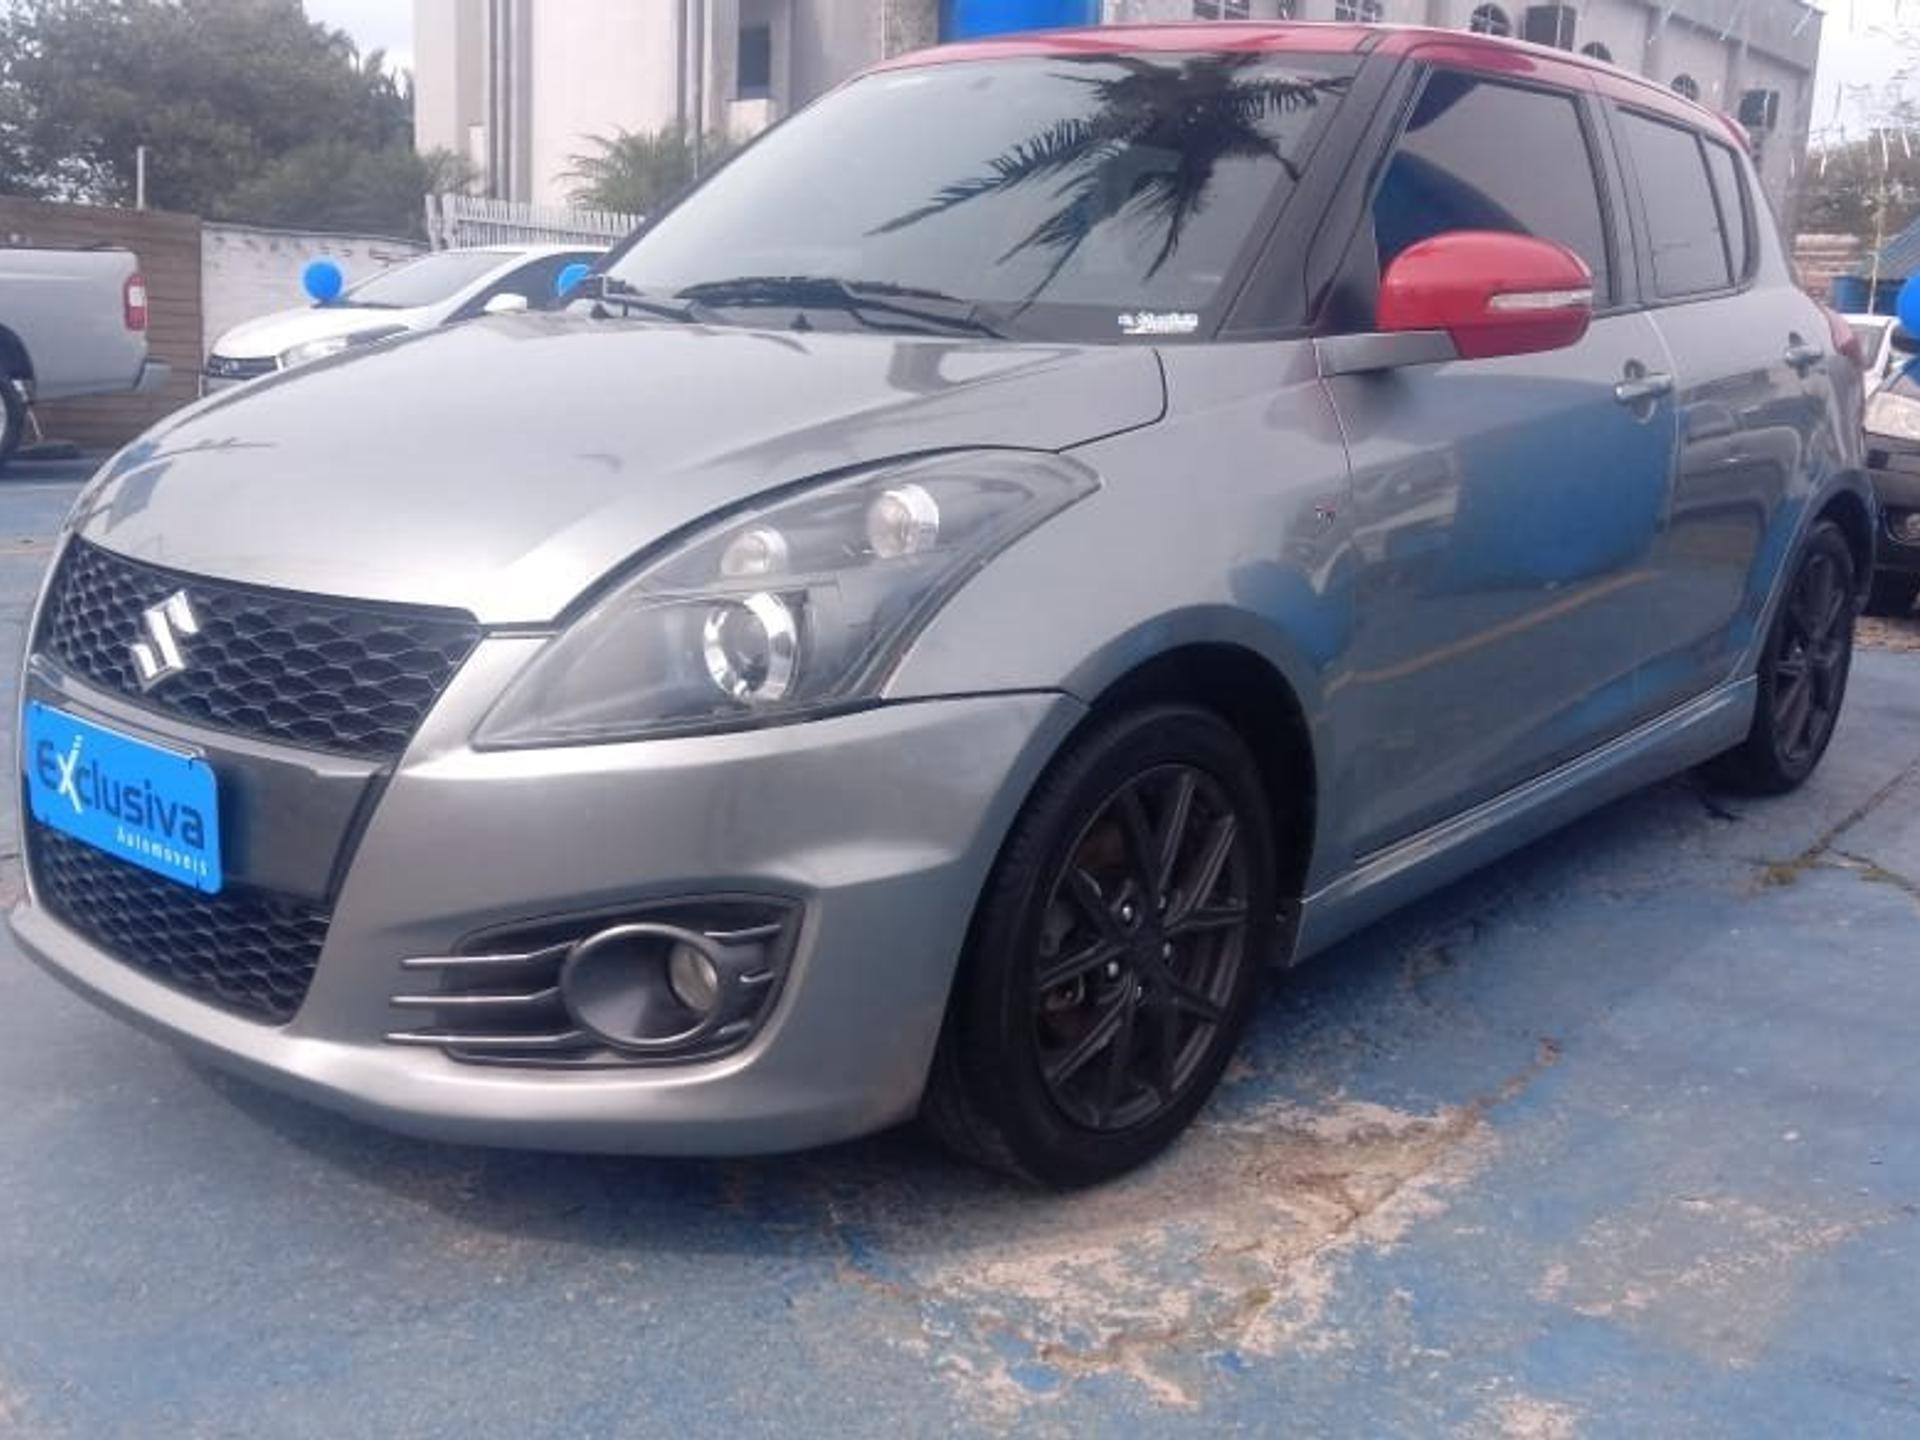 Suzuki Swift 1.6 Sport R 16v Gasolina 4p Manual Wmimagem11033927115